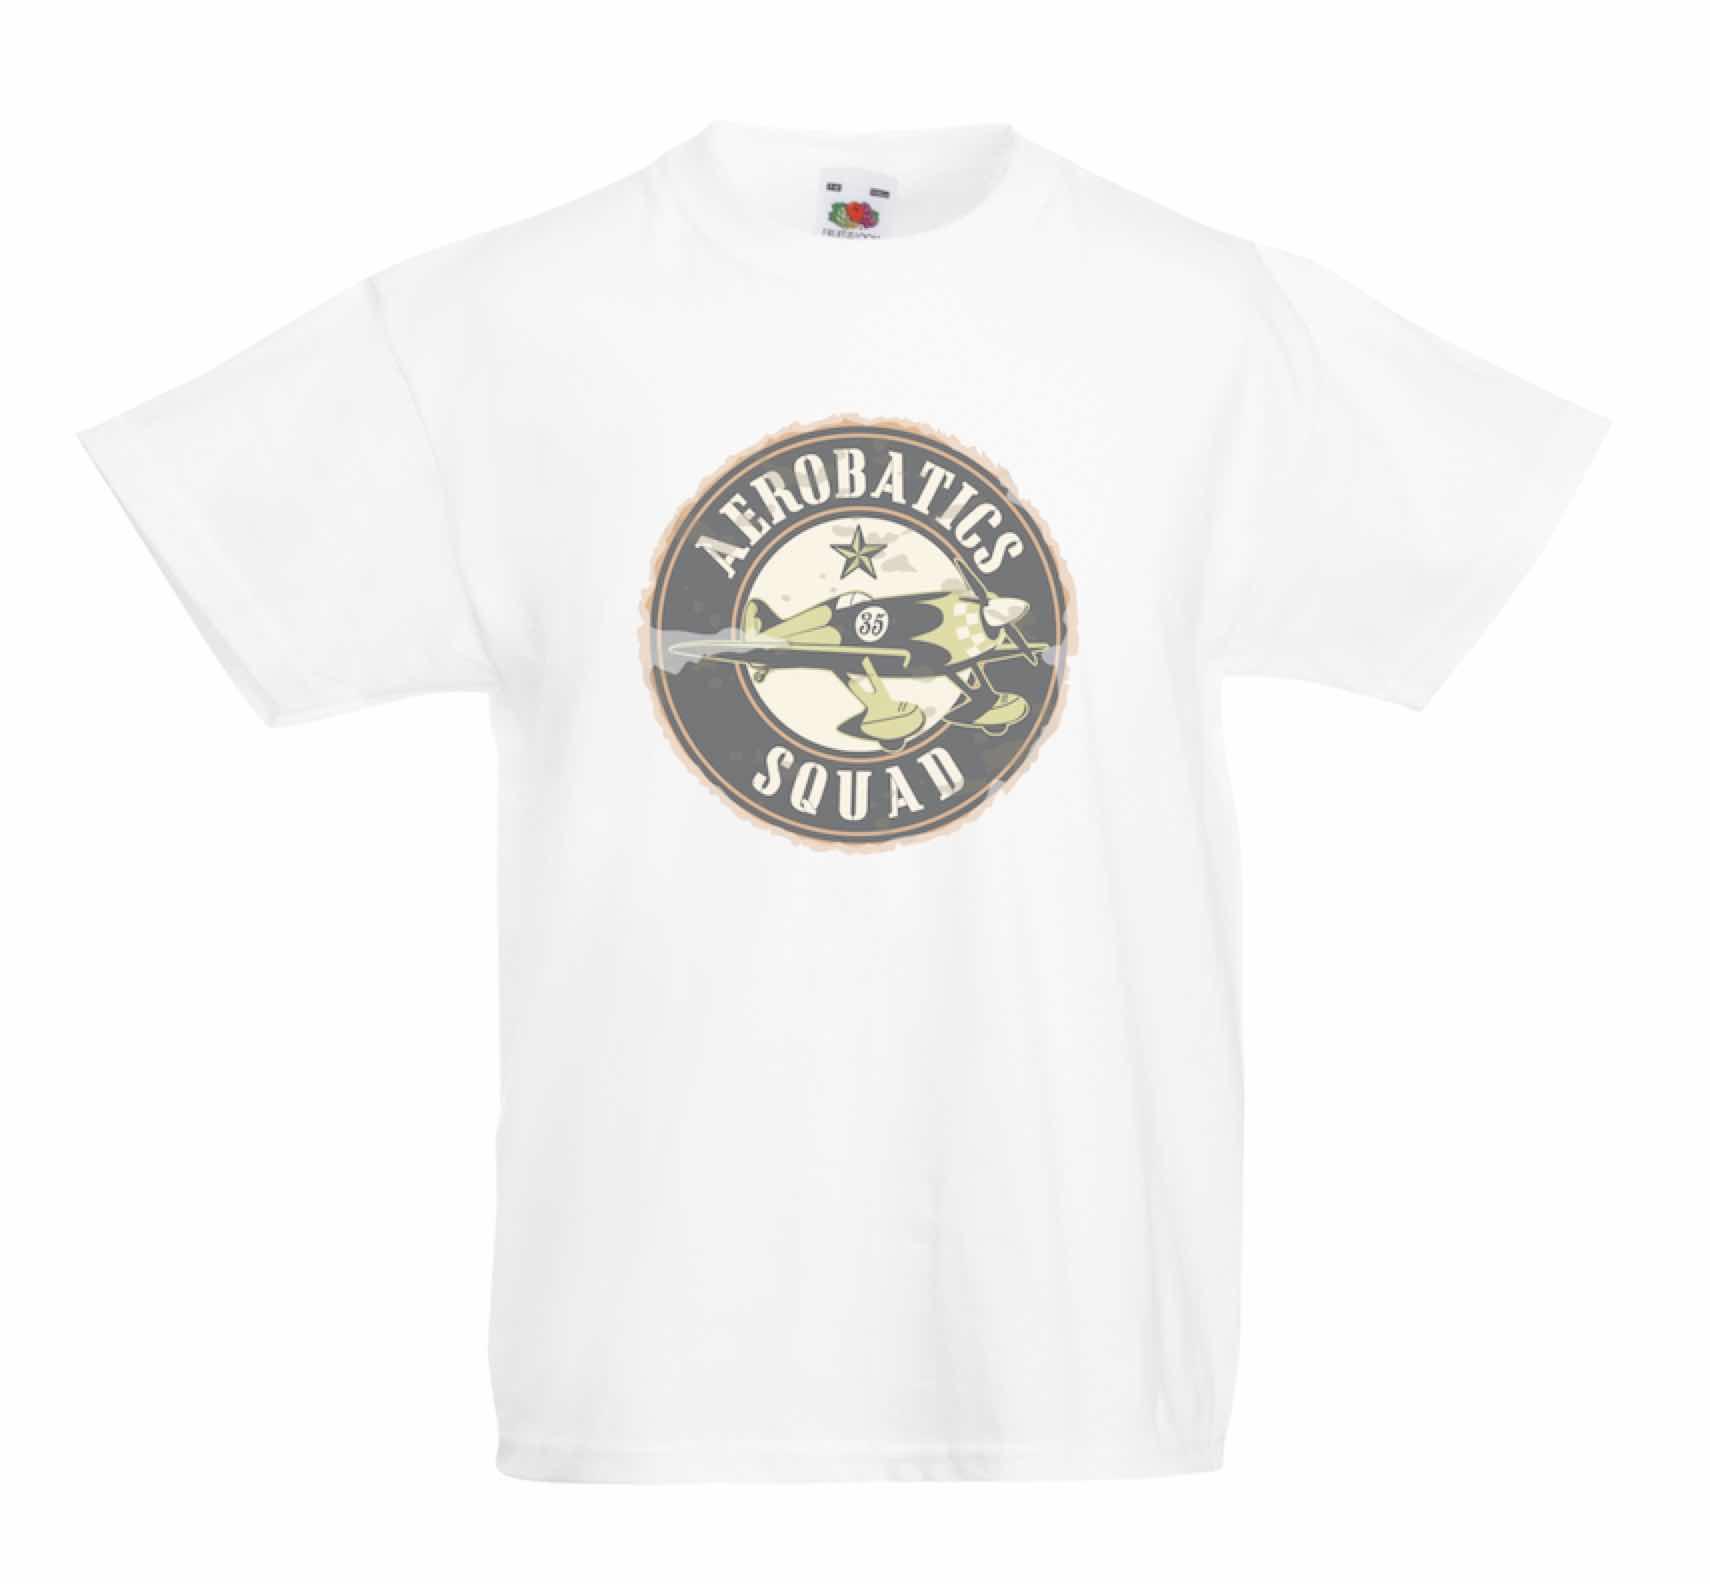 Aerobatics Squad design for t-shirt, hoodie & sweatshirt